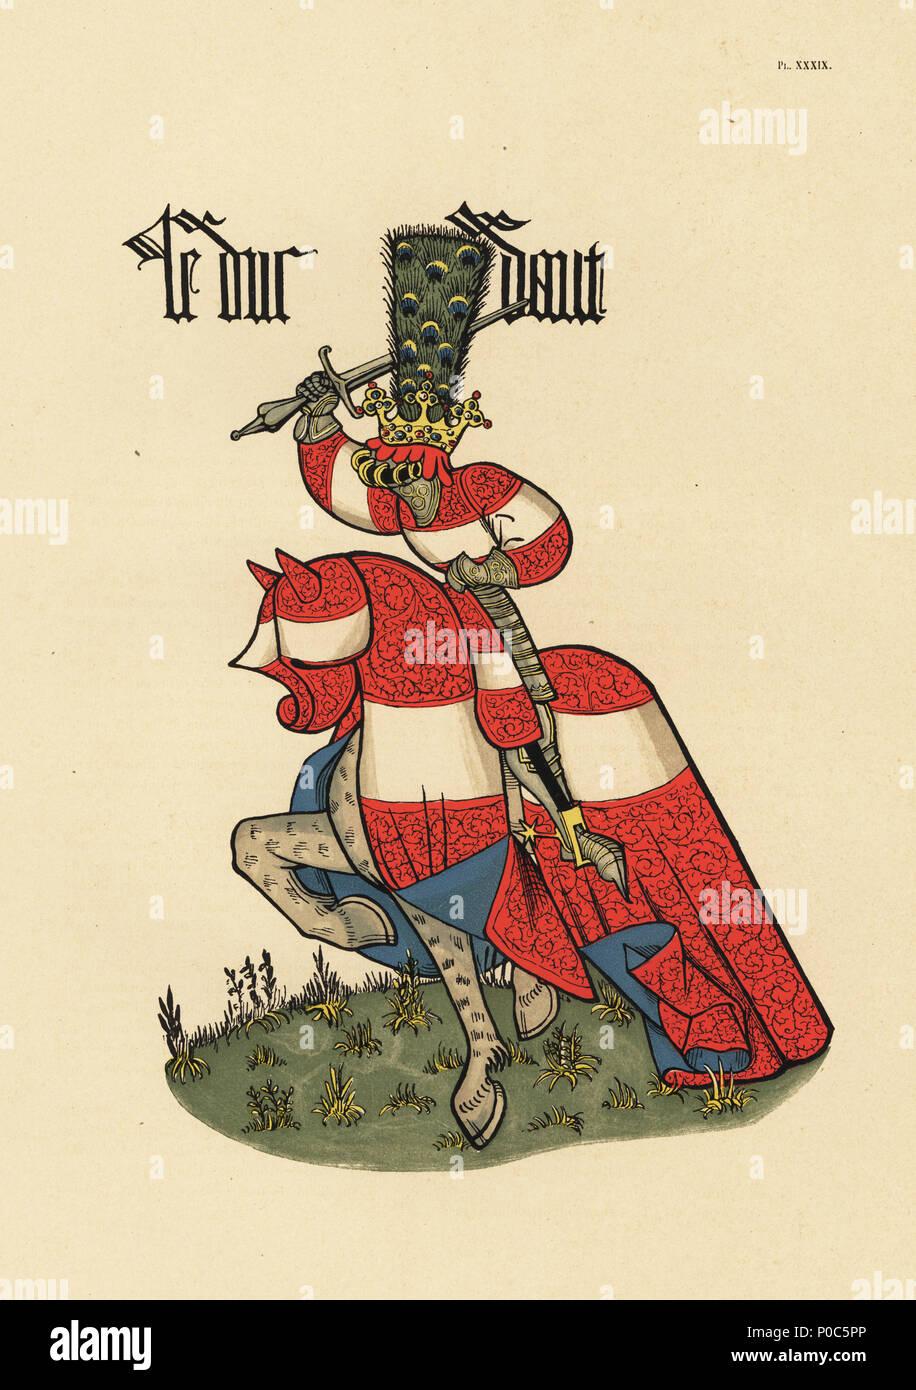 Duke of Austria, Duc d'Autriche. Chromolithograph from Loredan Larchey's Ancien Armorial Equestre de la Toison d'Or et de l'Europe au 15e siecle (Ancient Equestrian Armorials of the Order of the Golden Fleece and Europe in the 15th century), Paris, 1890. From illustrated manuscript 4790 in the Bibliotheque de l'Arsenal. - Stock Image